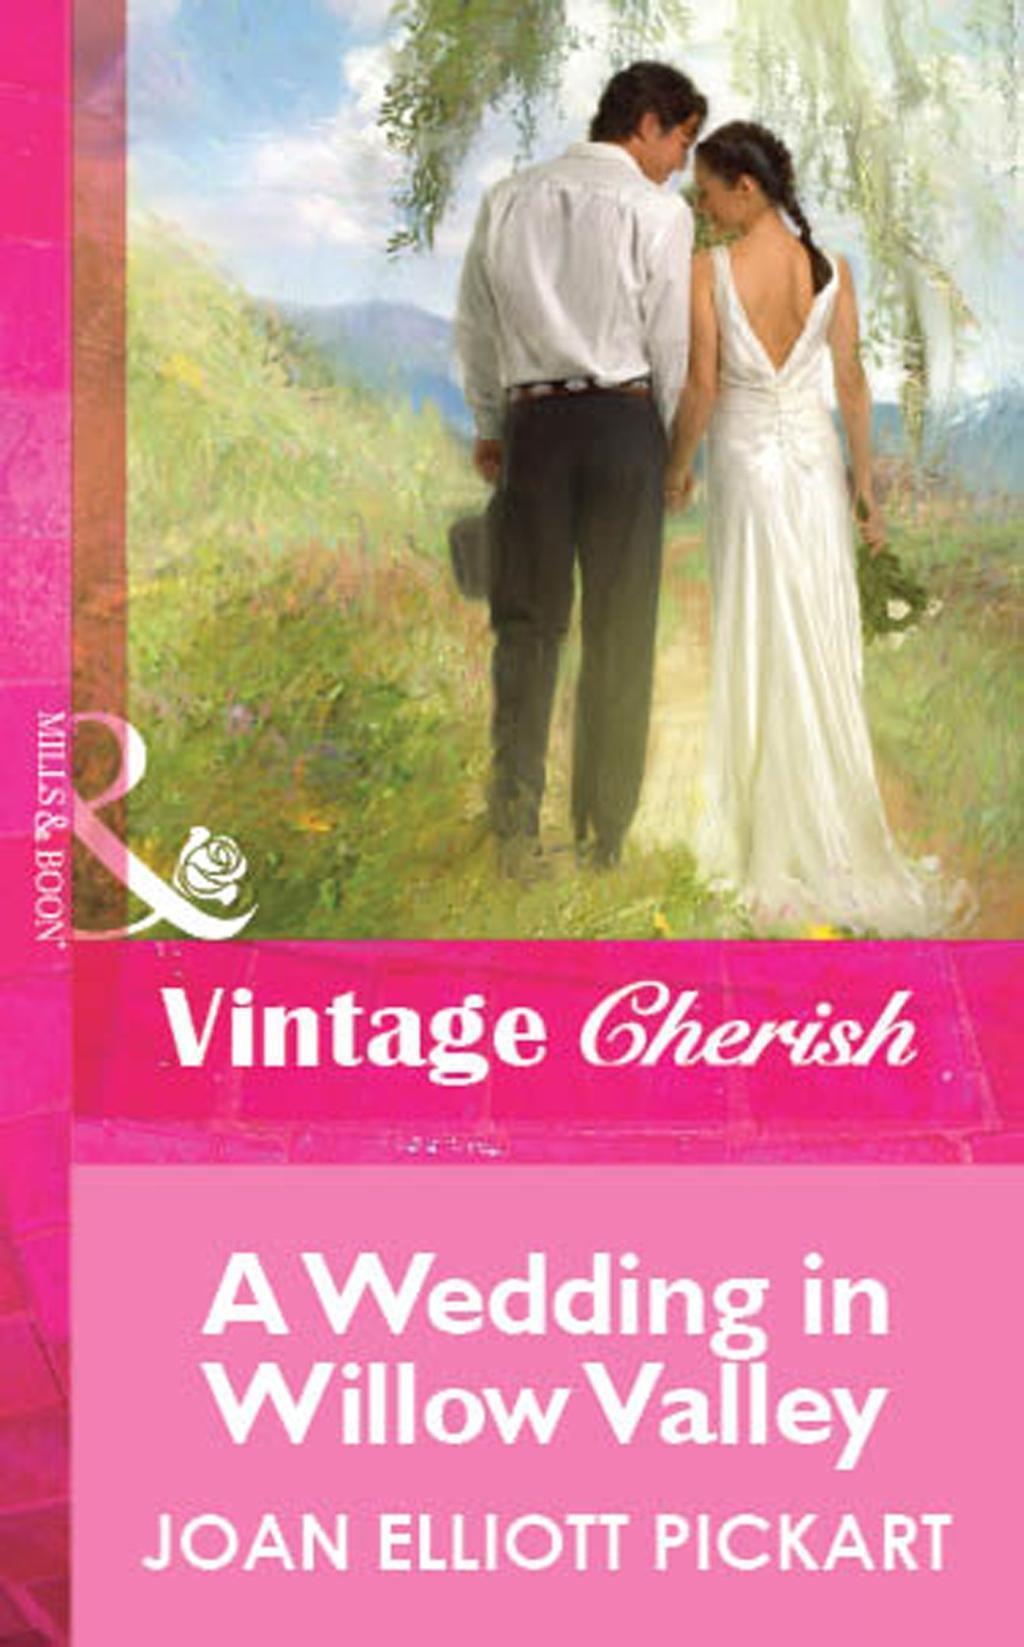 A Wedding In Willow Valley (Mills & Boon Vintage Cherish)